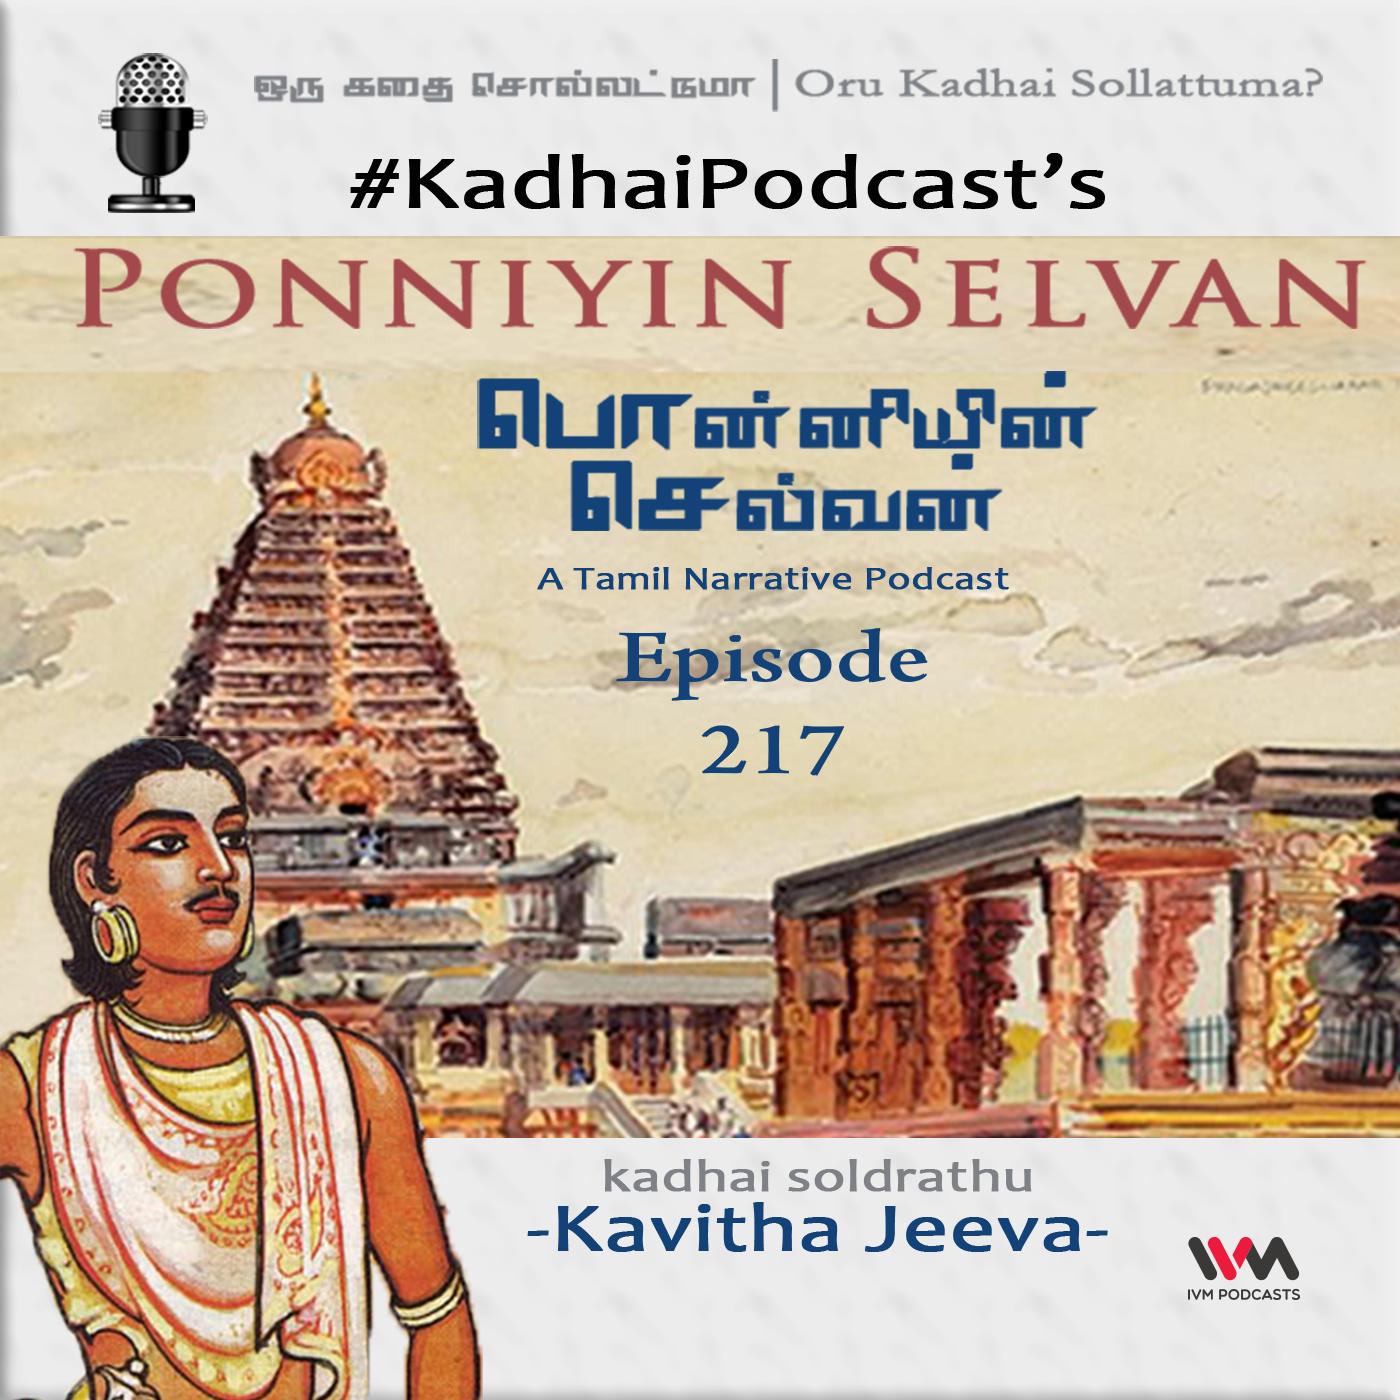 KadhaiPodcast's Ponniyin Selvan - Episode # 217